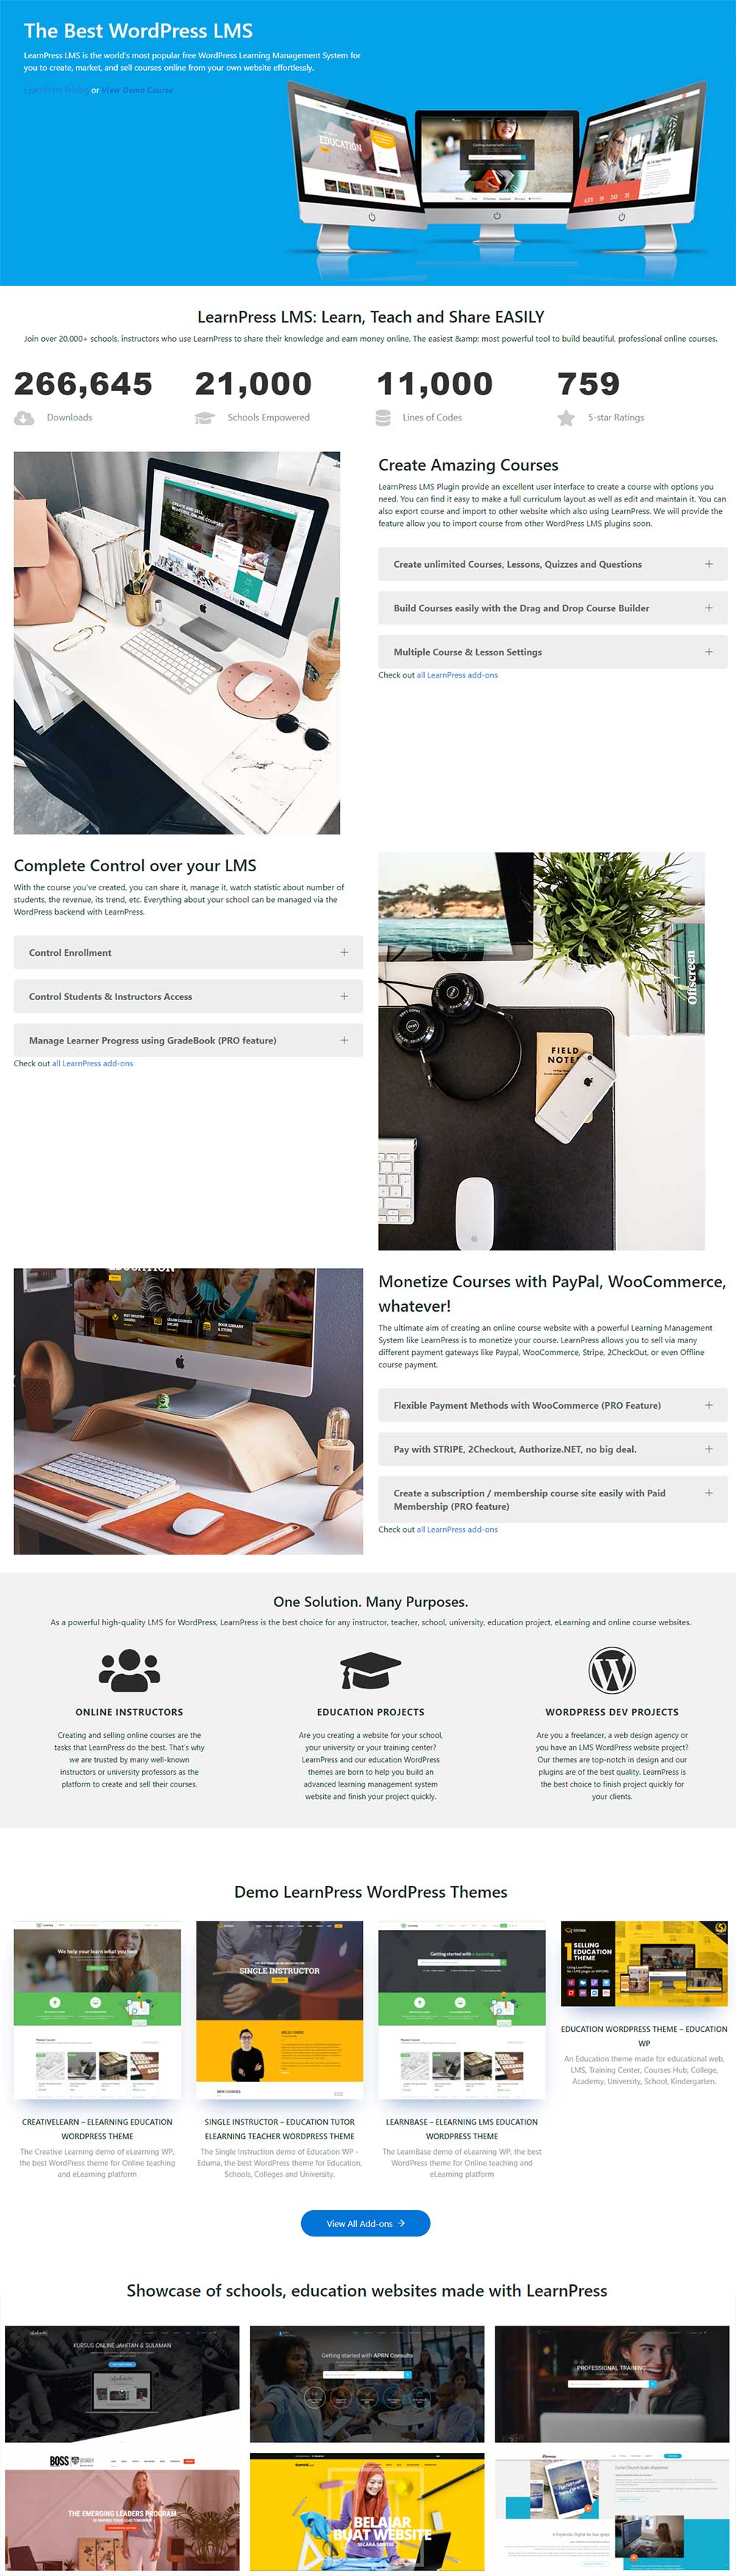 LearnPress - WordPress eLearning LMS Plugin